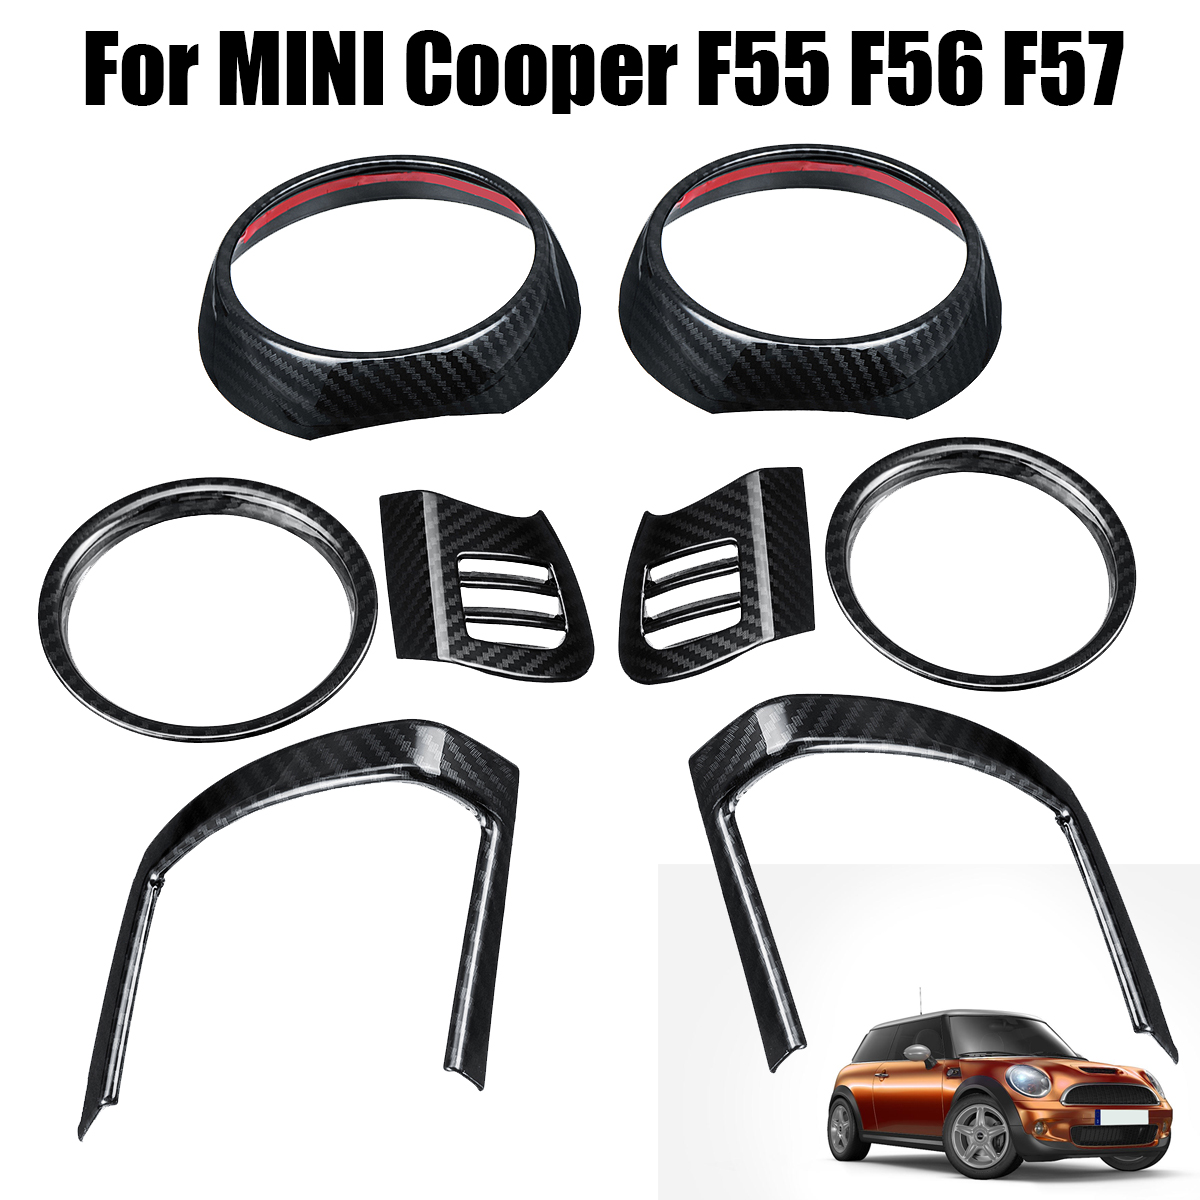 8 pz Dash Air Vent Copertura per BMW per MINI Cooper F55 F56 F57 In Fibra di Carbonio Modanature interne Auto Aria presa di Trims Adesivi